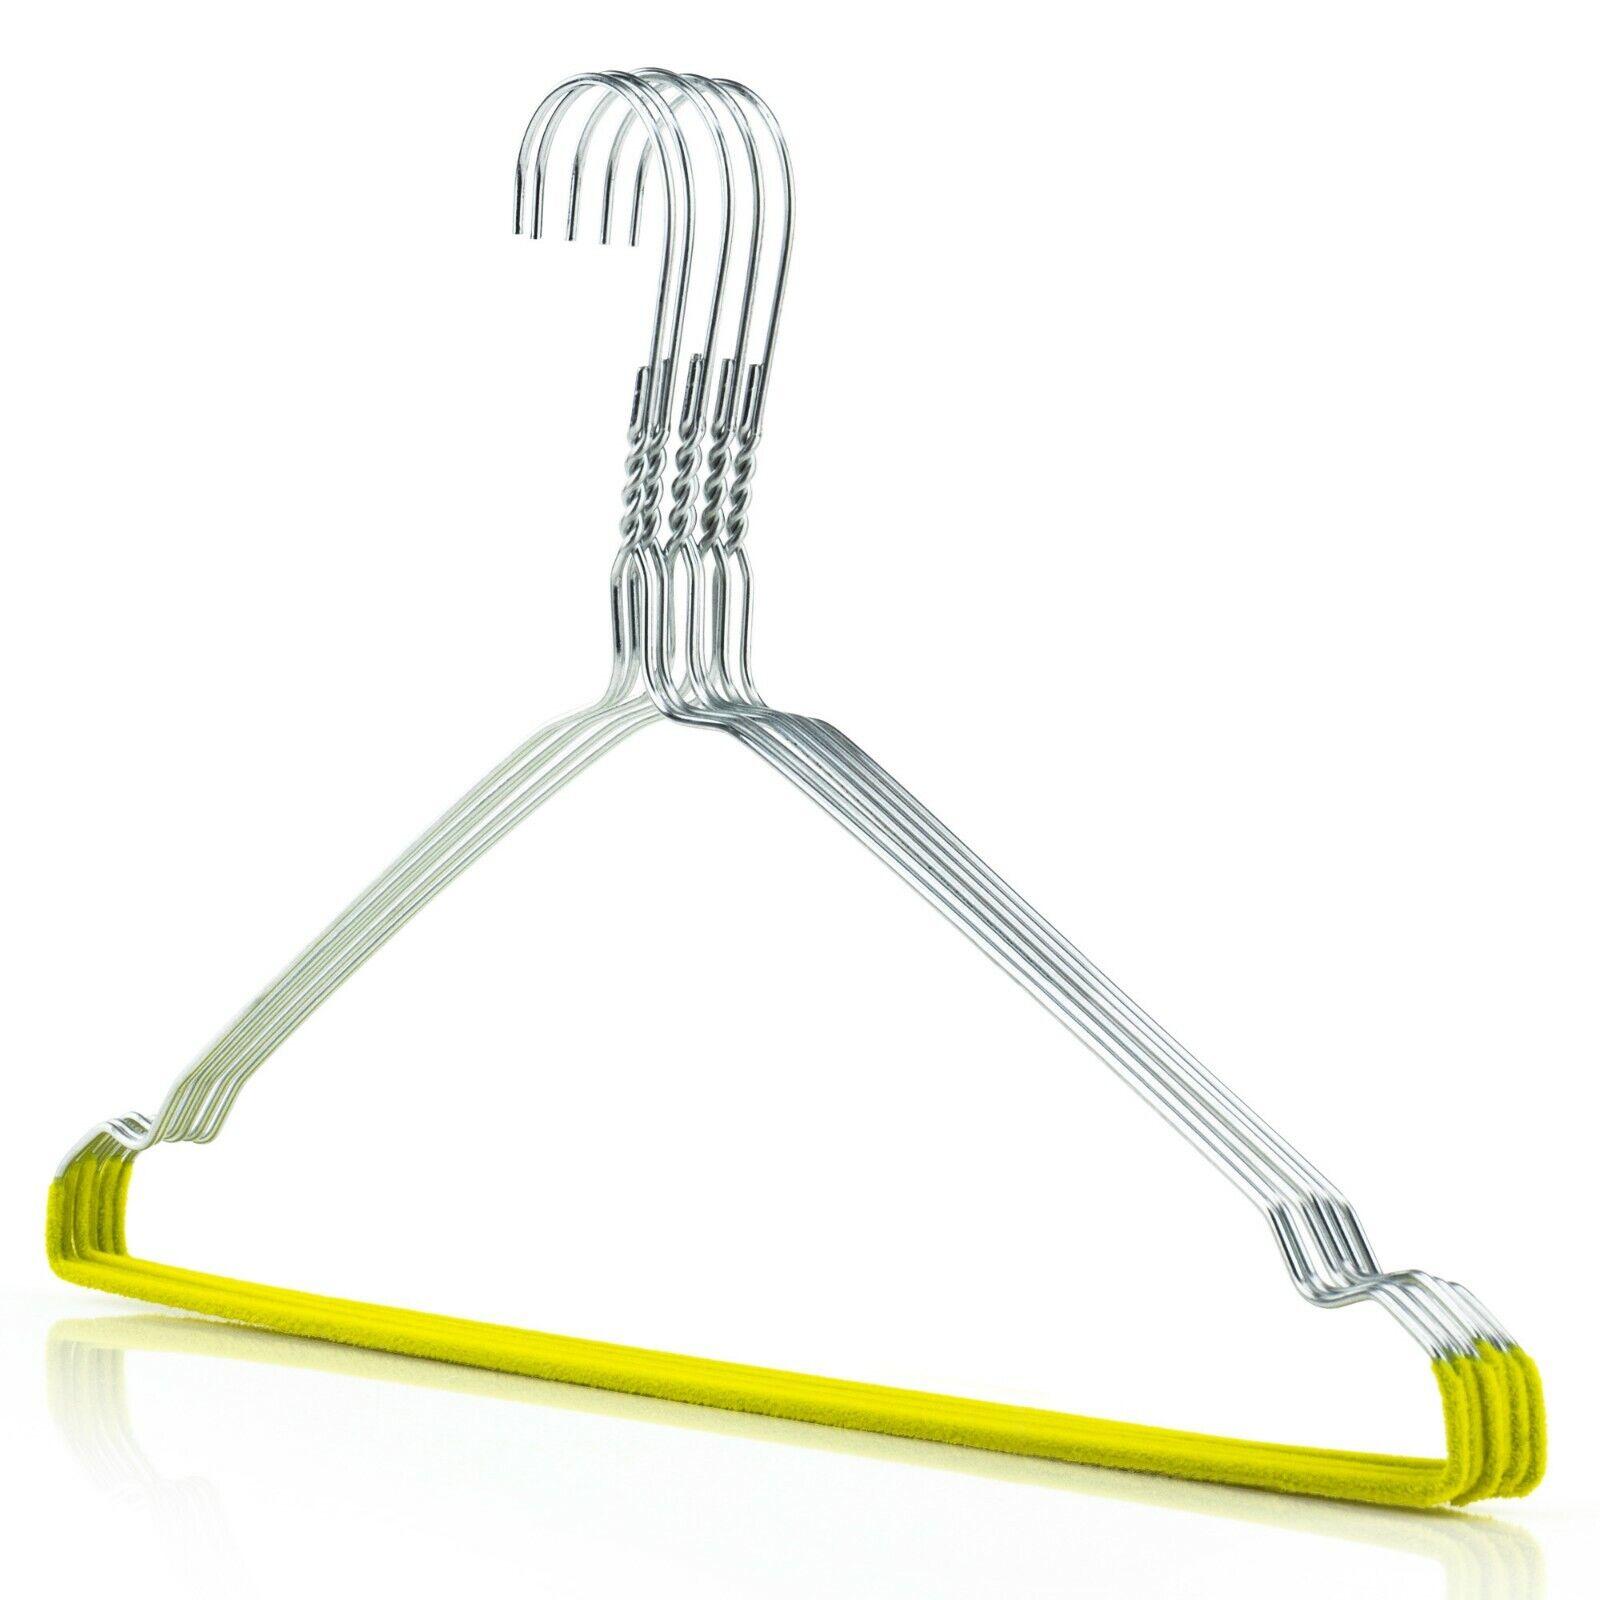 Hangerworld™ 40cm Silver Metal Wire Notch Hangers Coat Clothes Non Slip Flocked